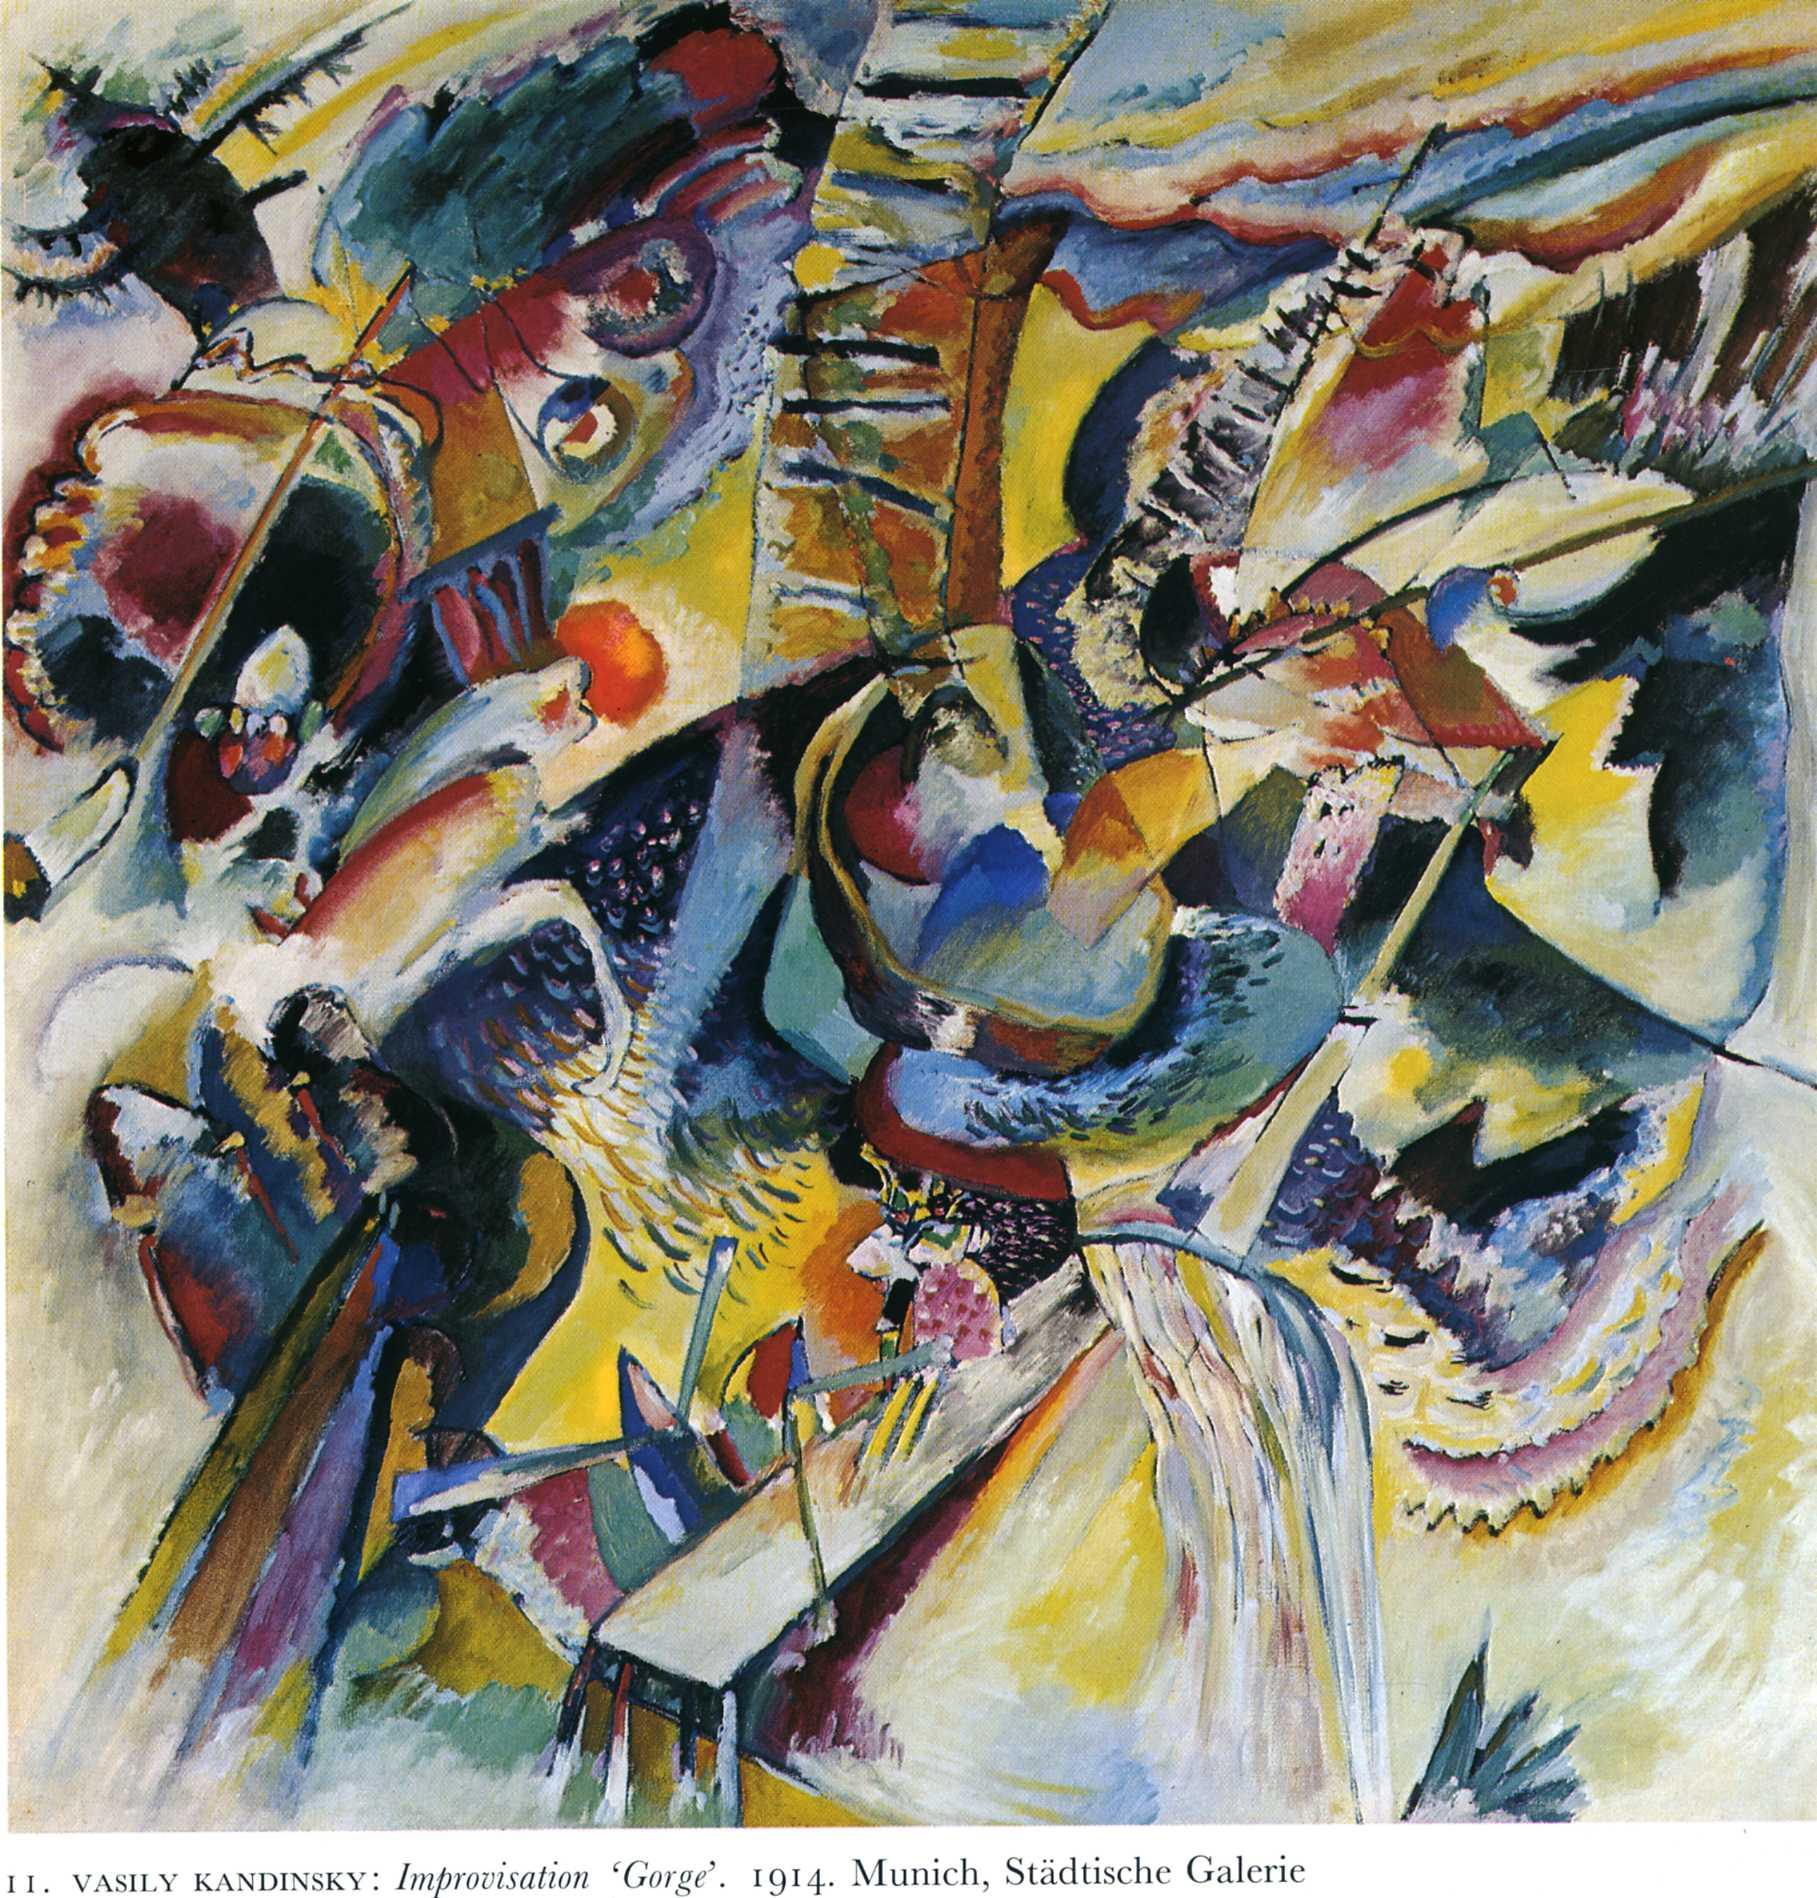 http://uploads3.wikiart.org/images/wassily-kandinsky/improvisation-gorge-1914.jpg